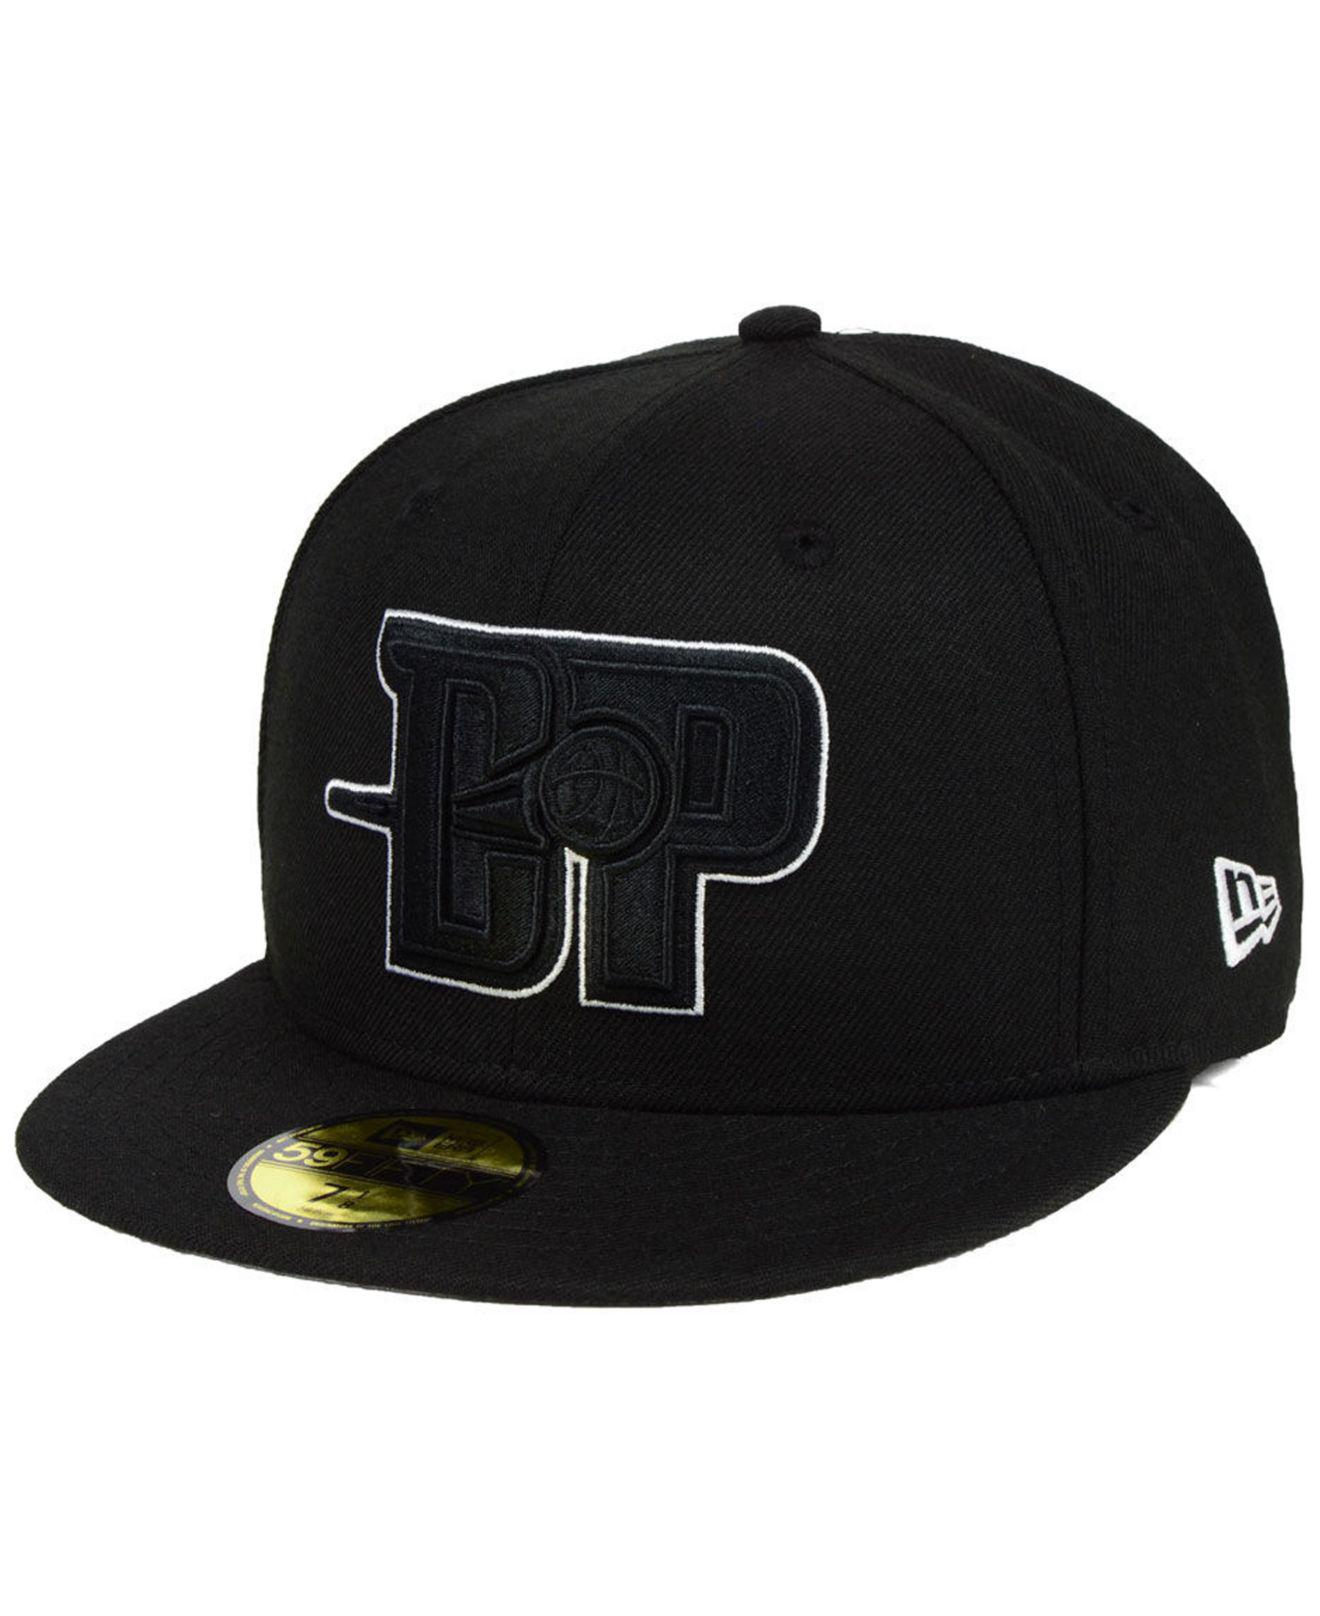 promo code c6cd1 03da1 ... Detroit Pistons Combo Logo 59fifty Fitted Cap for Men - Lyst. View  fullscreen